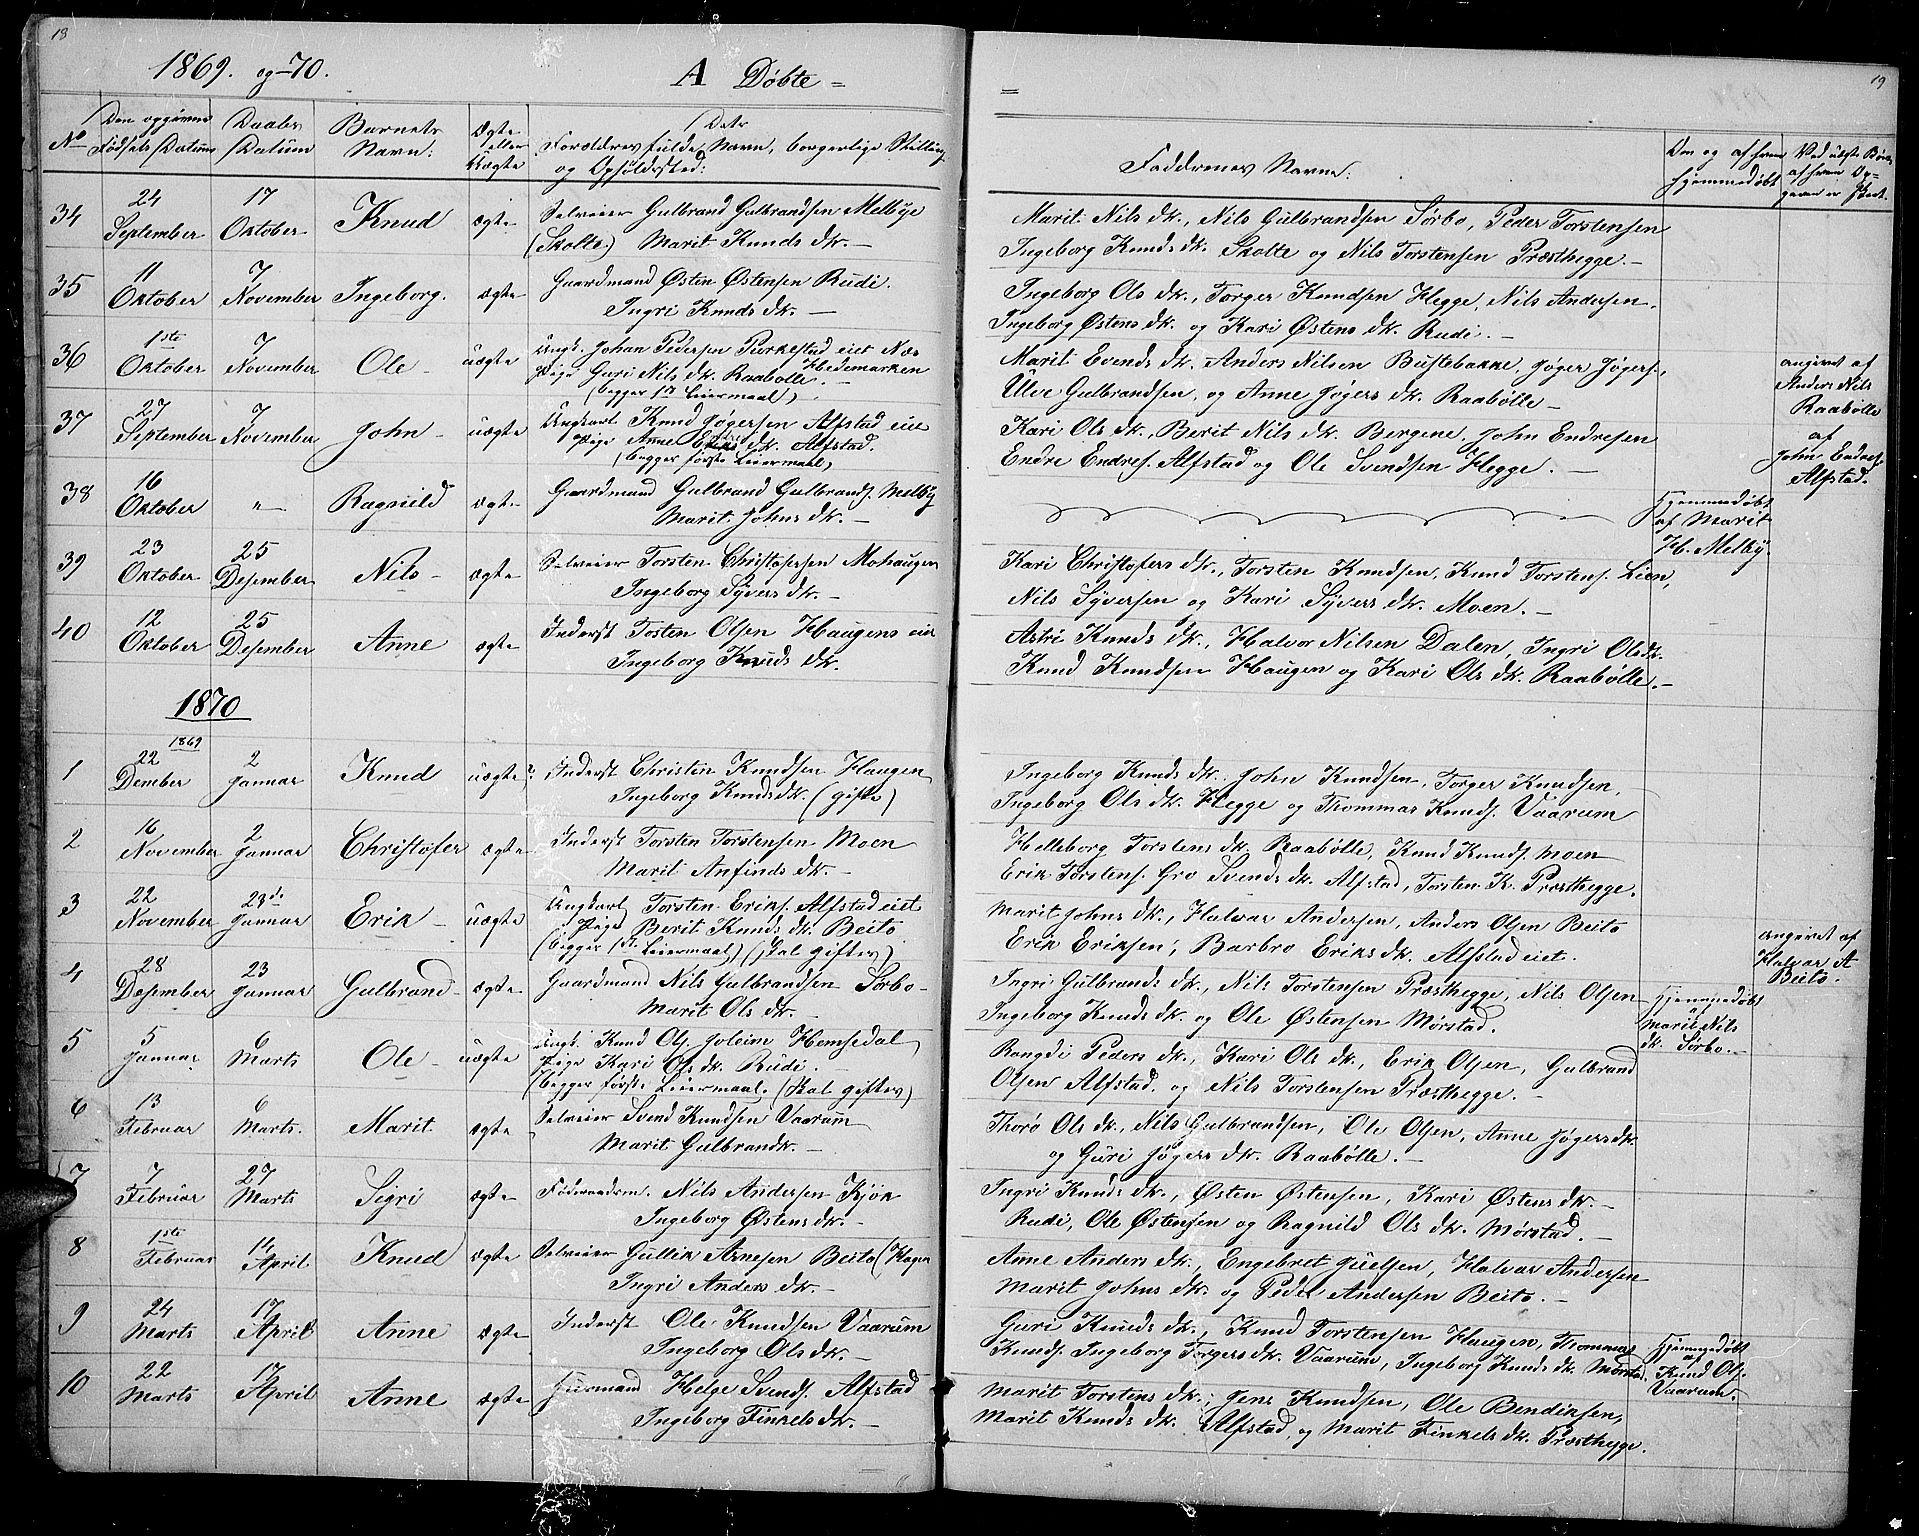 SAH, Øystre Slidre prestekontor, Klokkerbok nr. 1, 1866-1886, s. 18-19